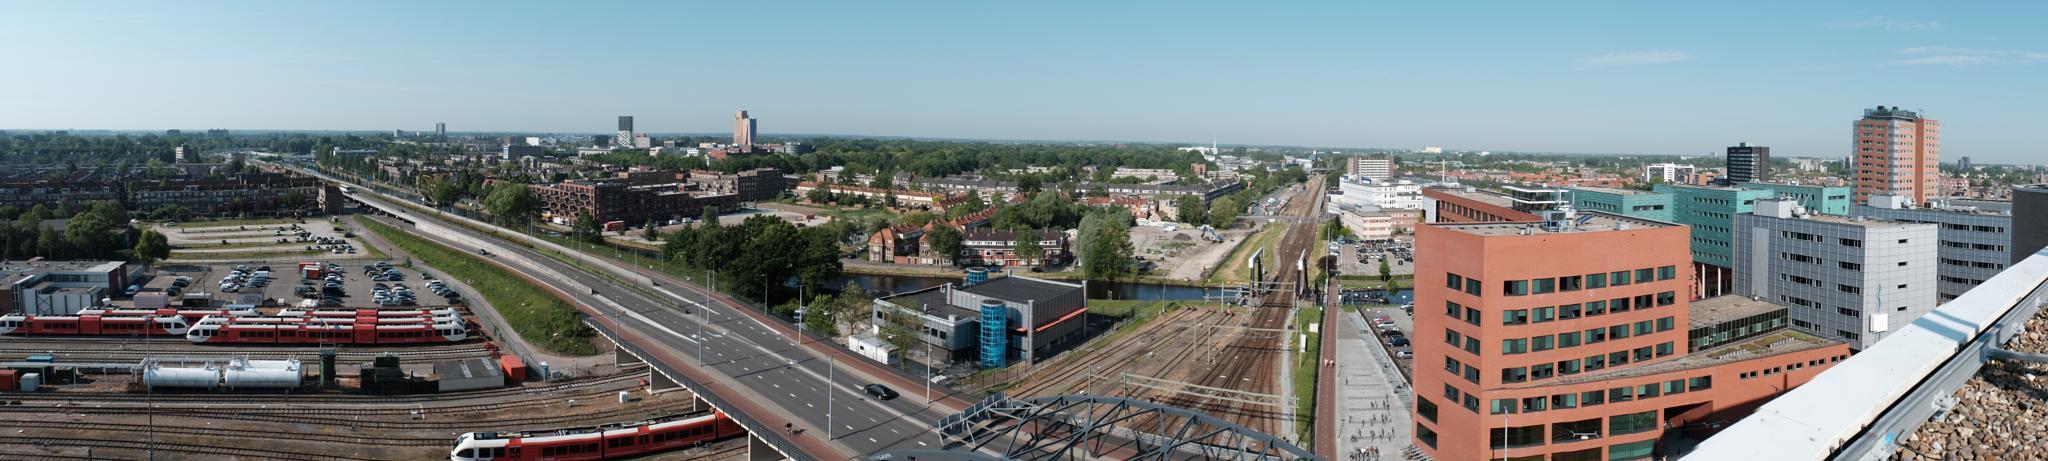 Cityscape by Ropje